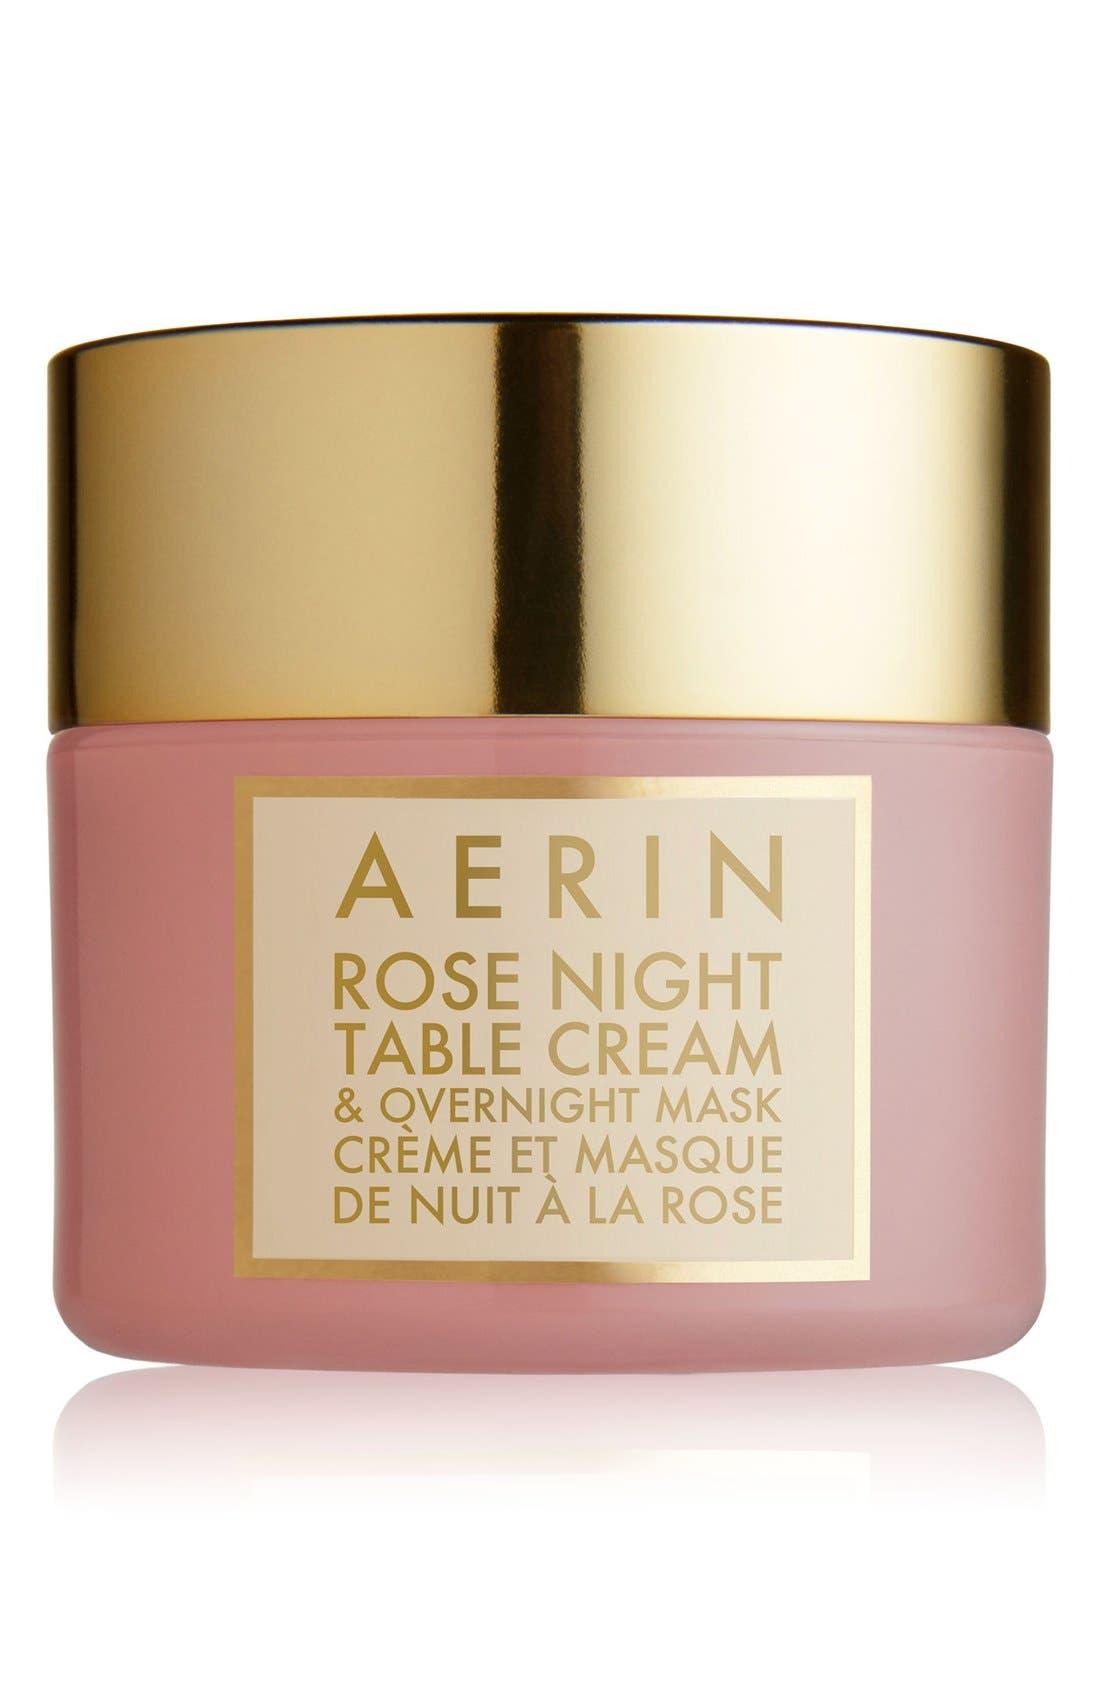 AERIN Beauty Rose Night Table Cream & Overnight Mask